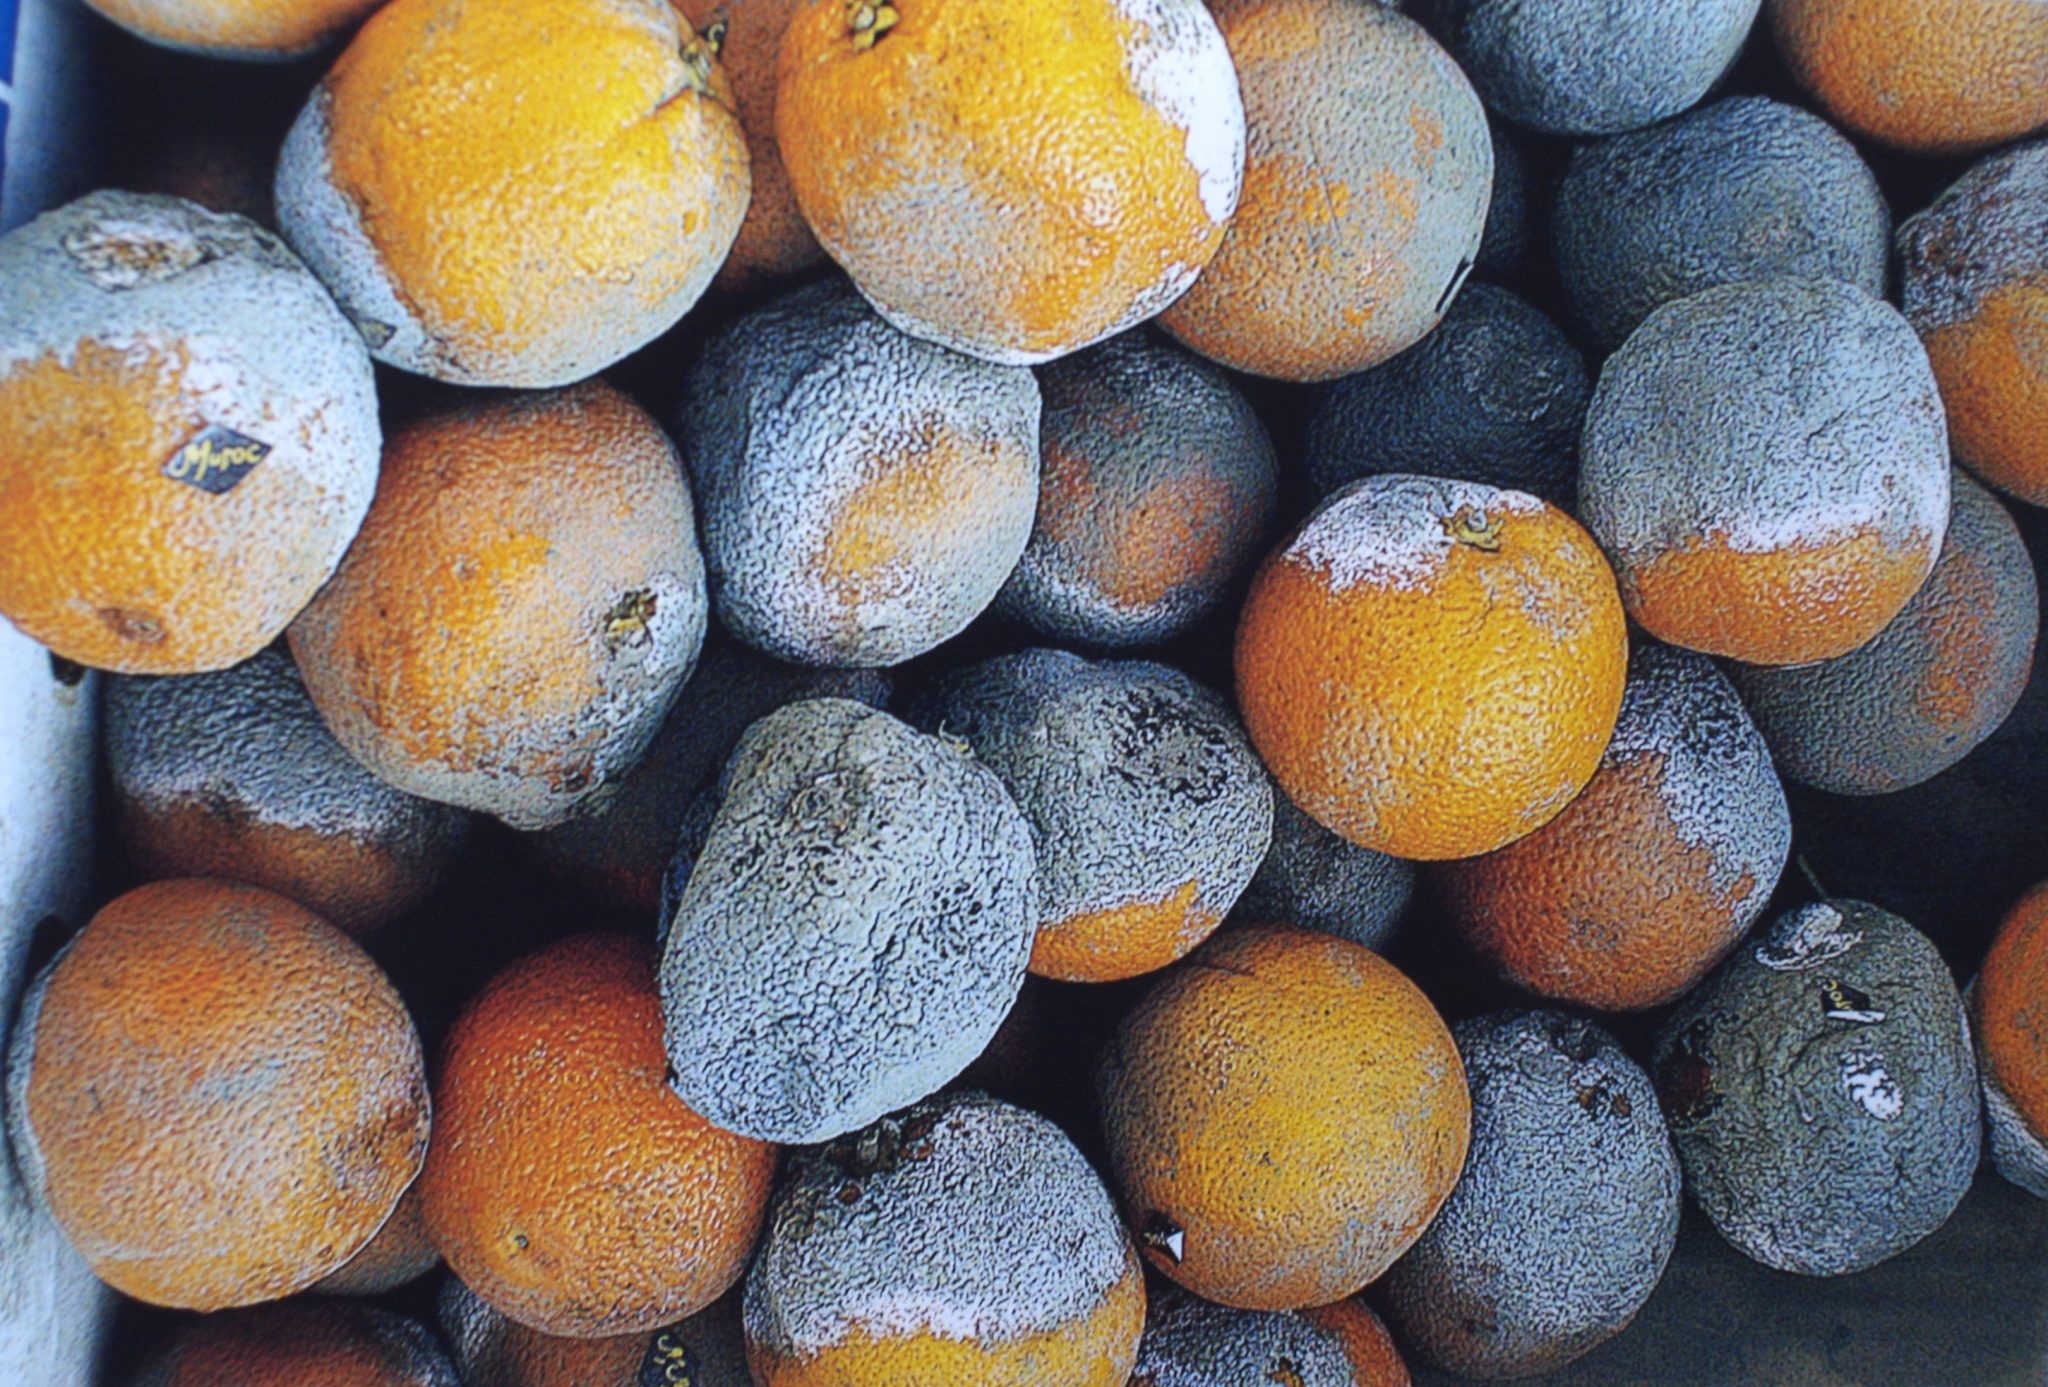 anti-orange campaign imagery - mouldy oranges